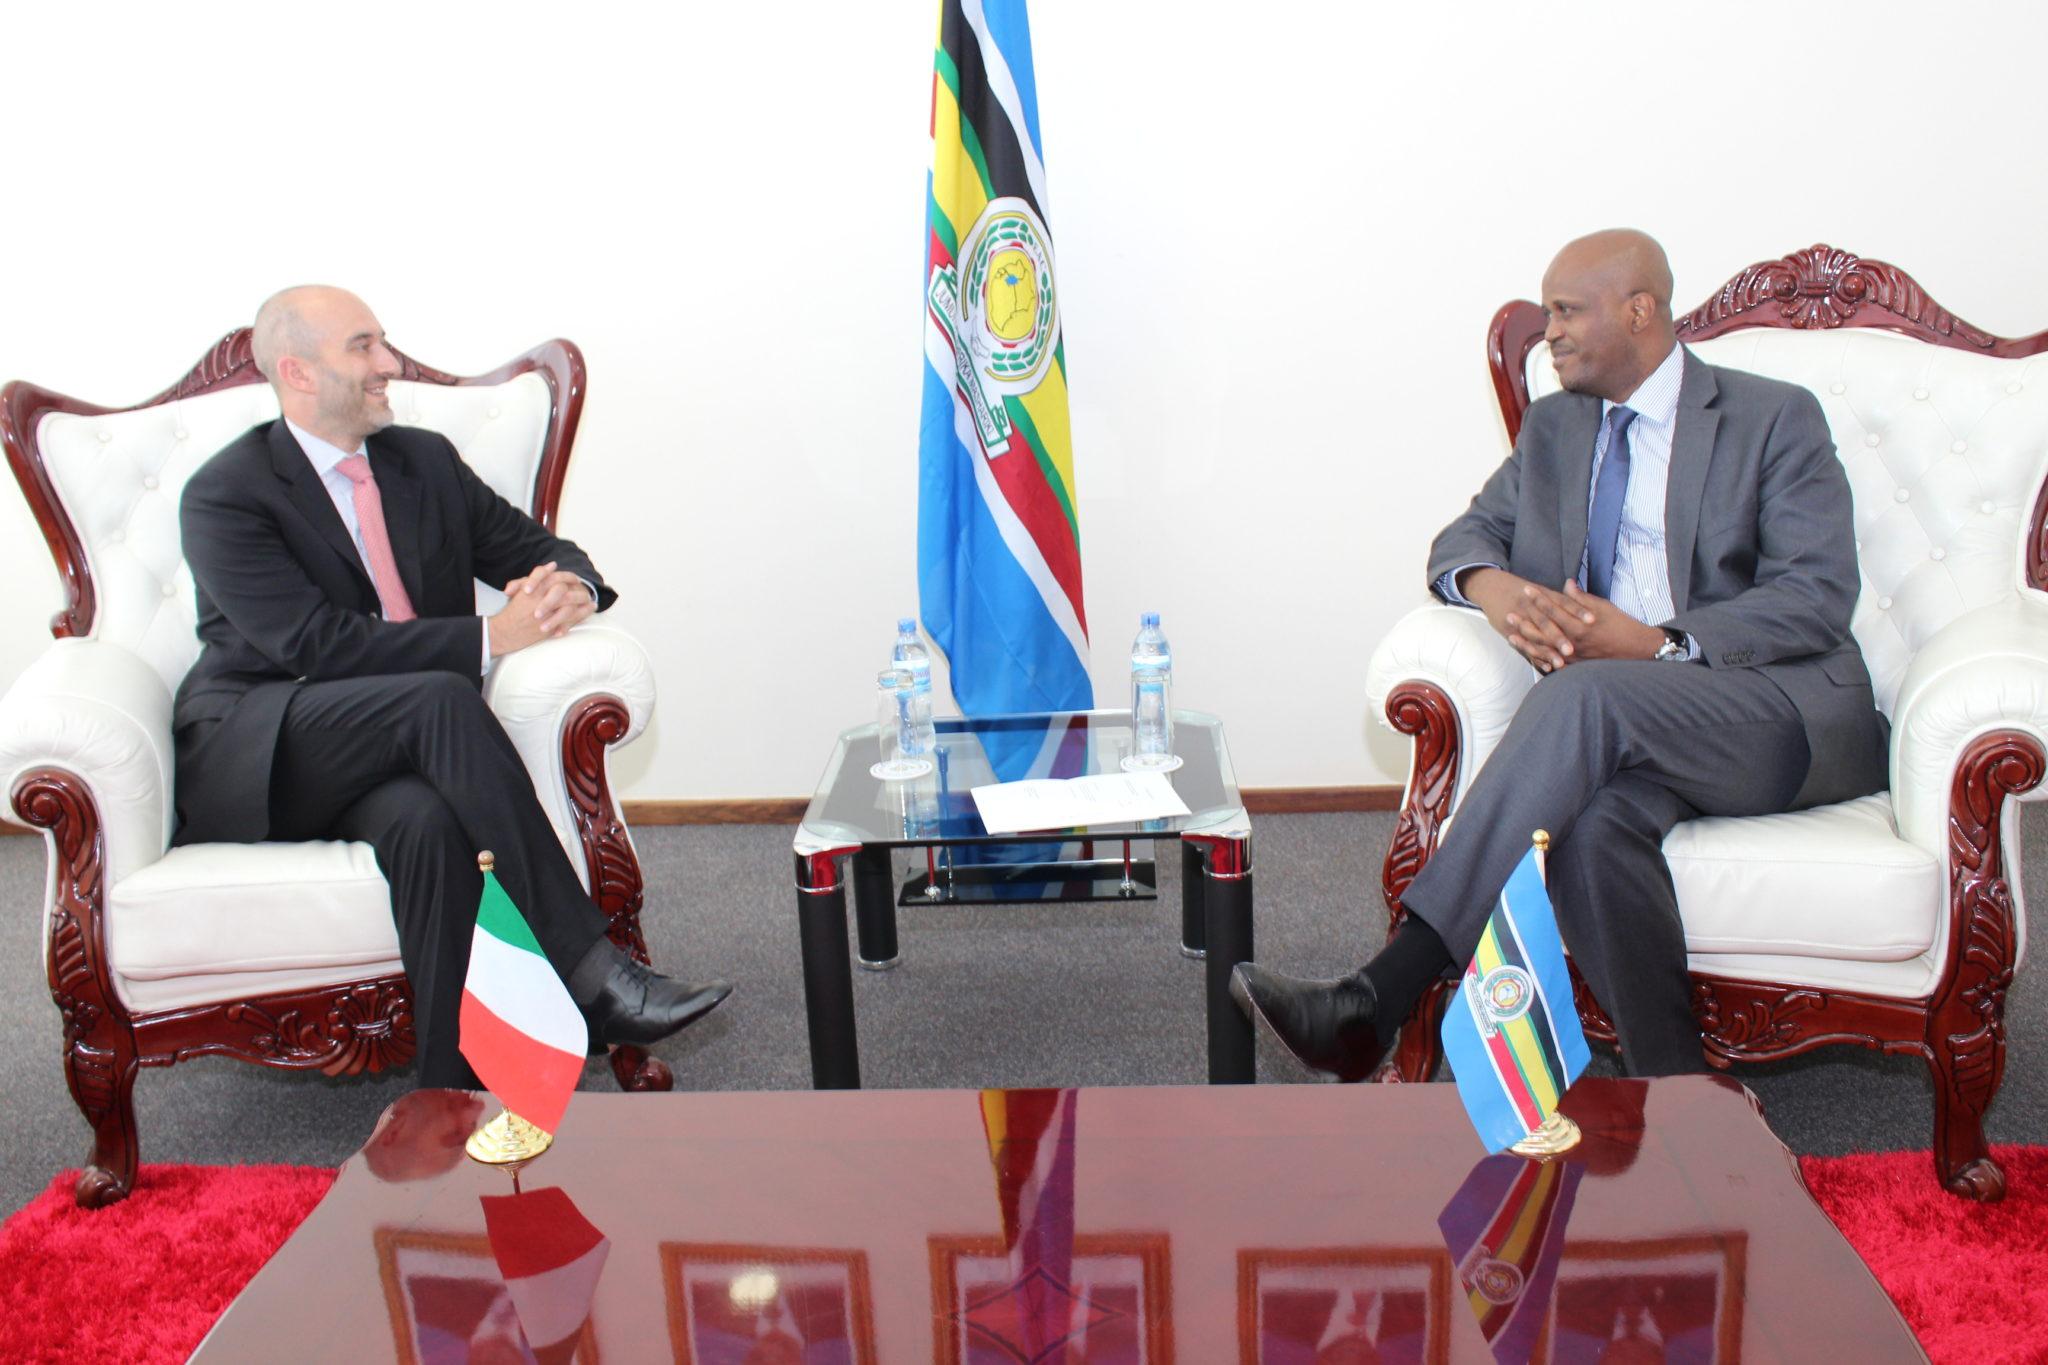 EAC Secretary General, Amb. Liberat Mfumukeko in discussion with the Amb Roberto Mengoni.